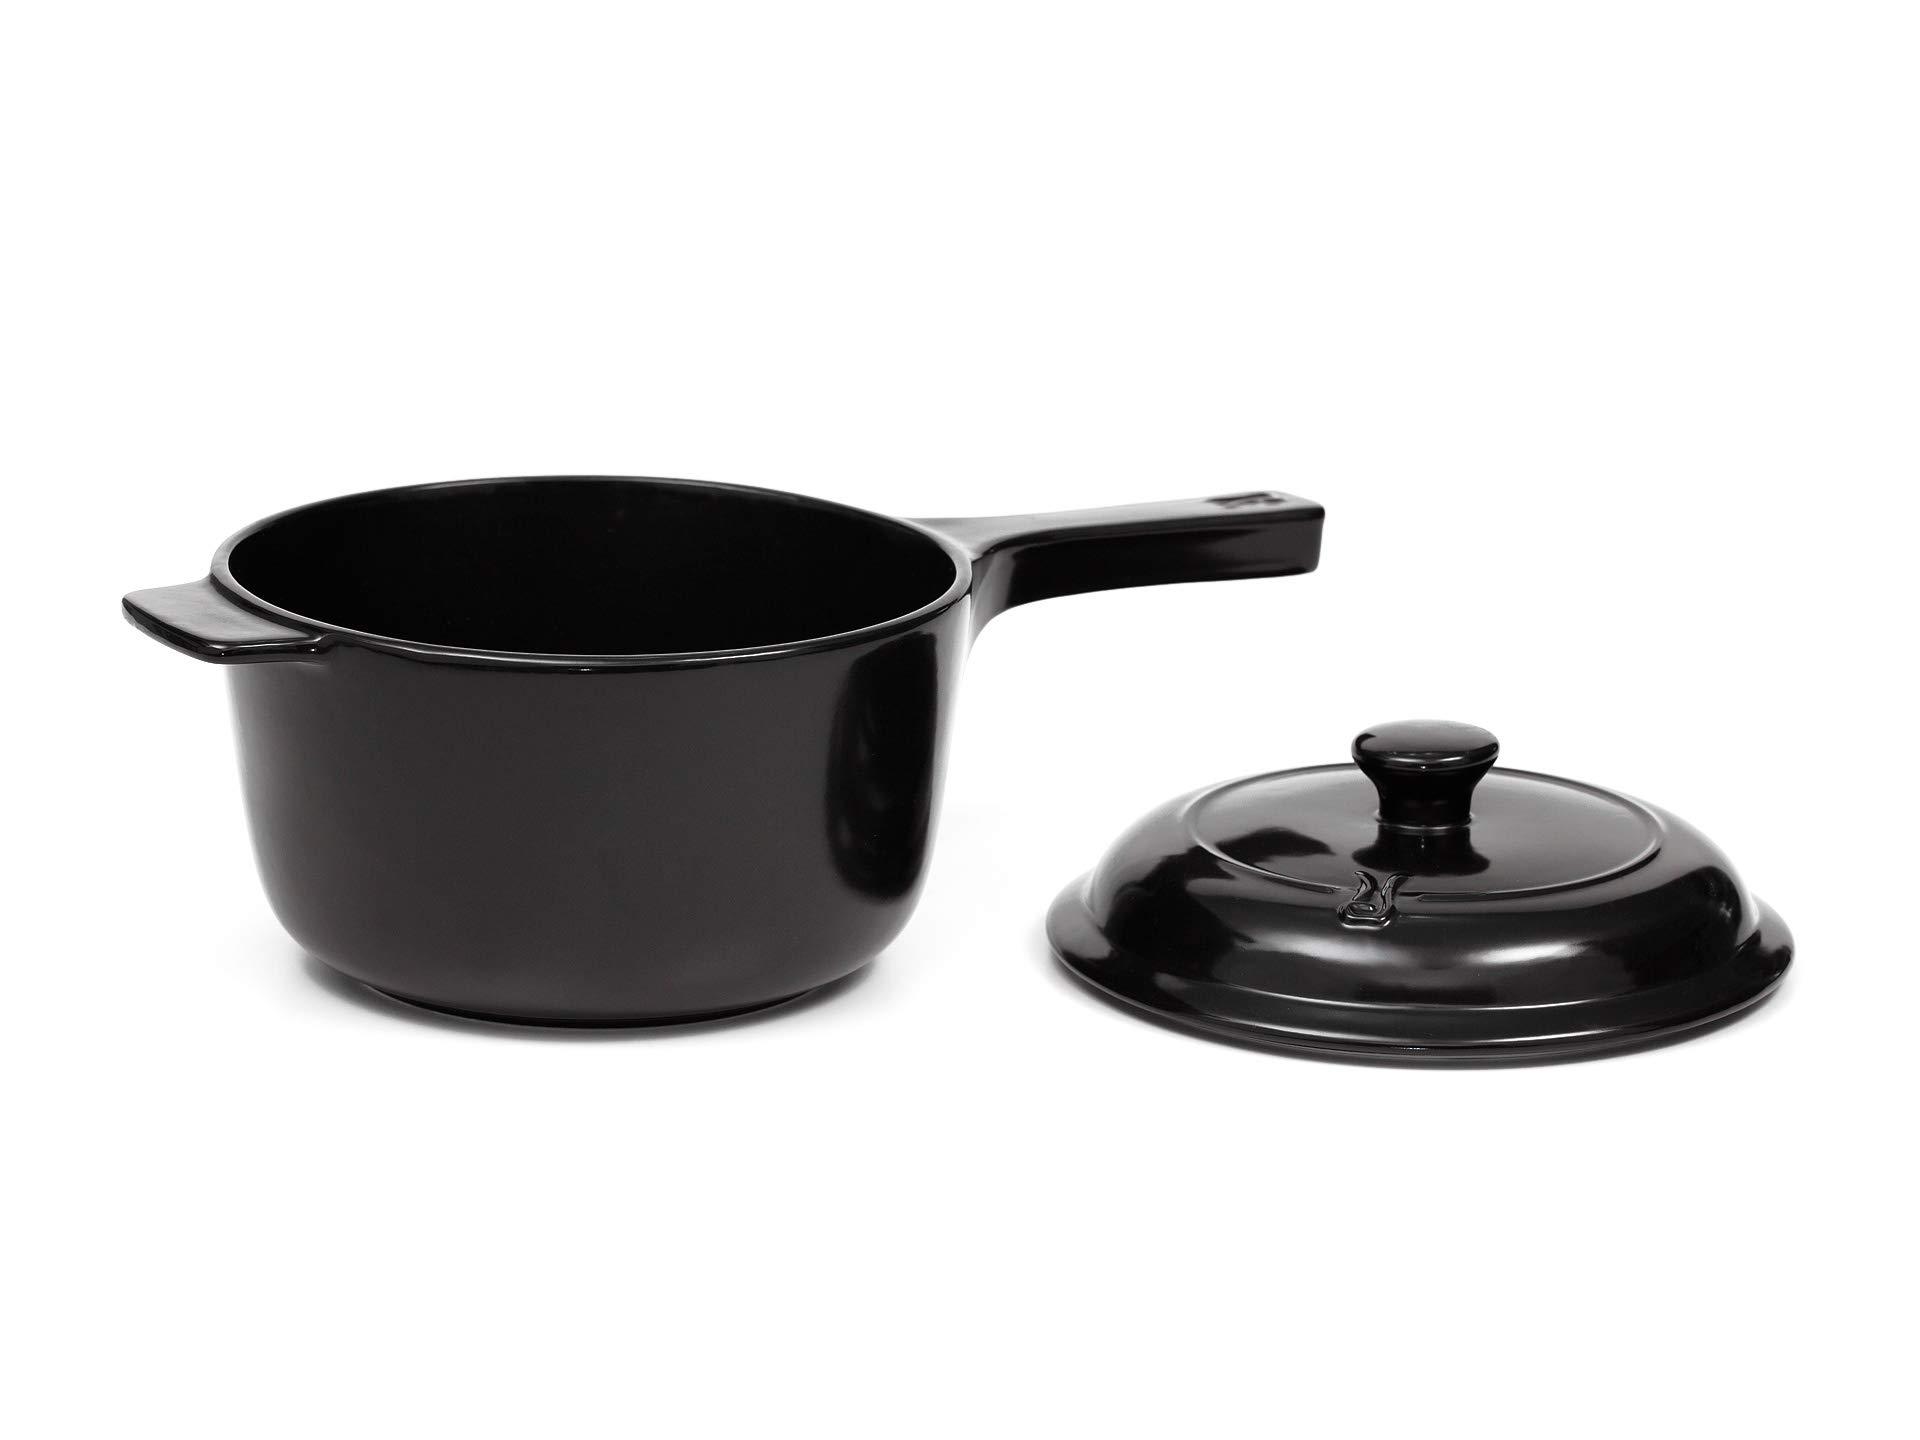 Xtrema 3.5-Quart Traditions 100% Ceramic Black Saucepan